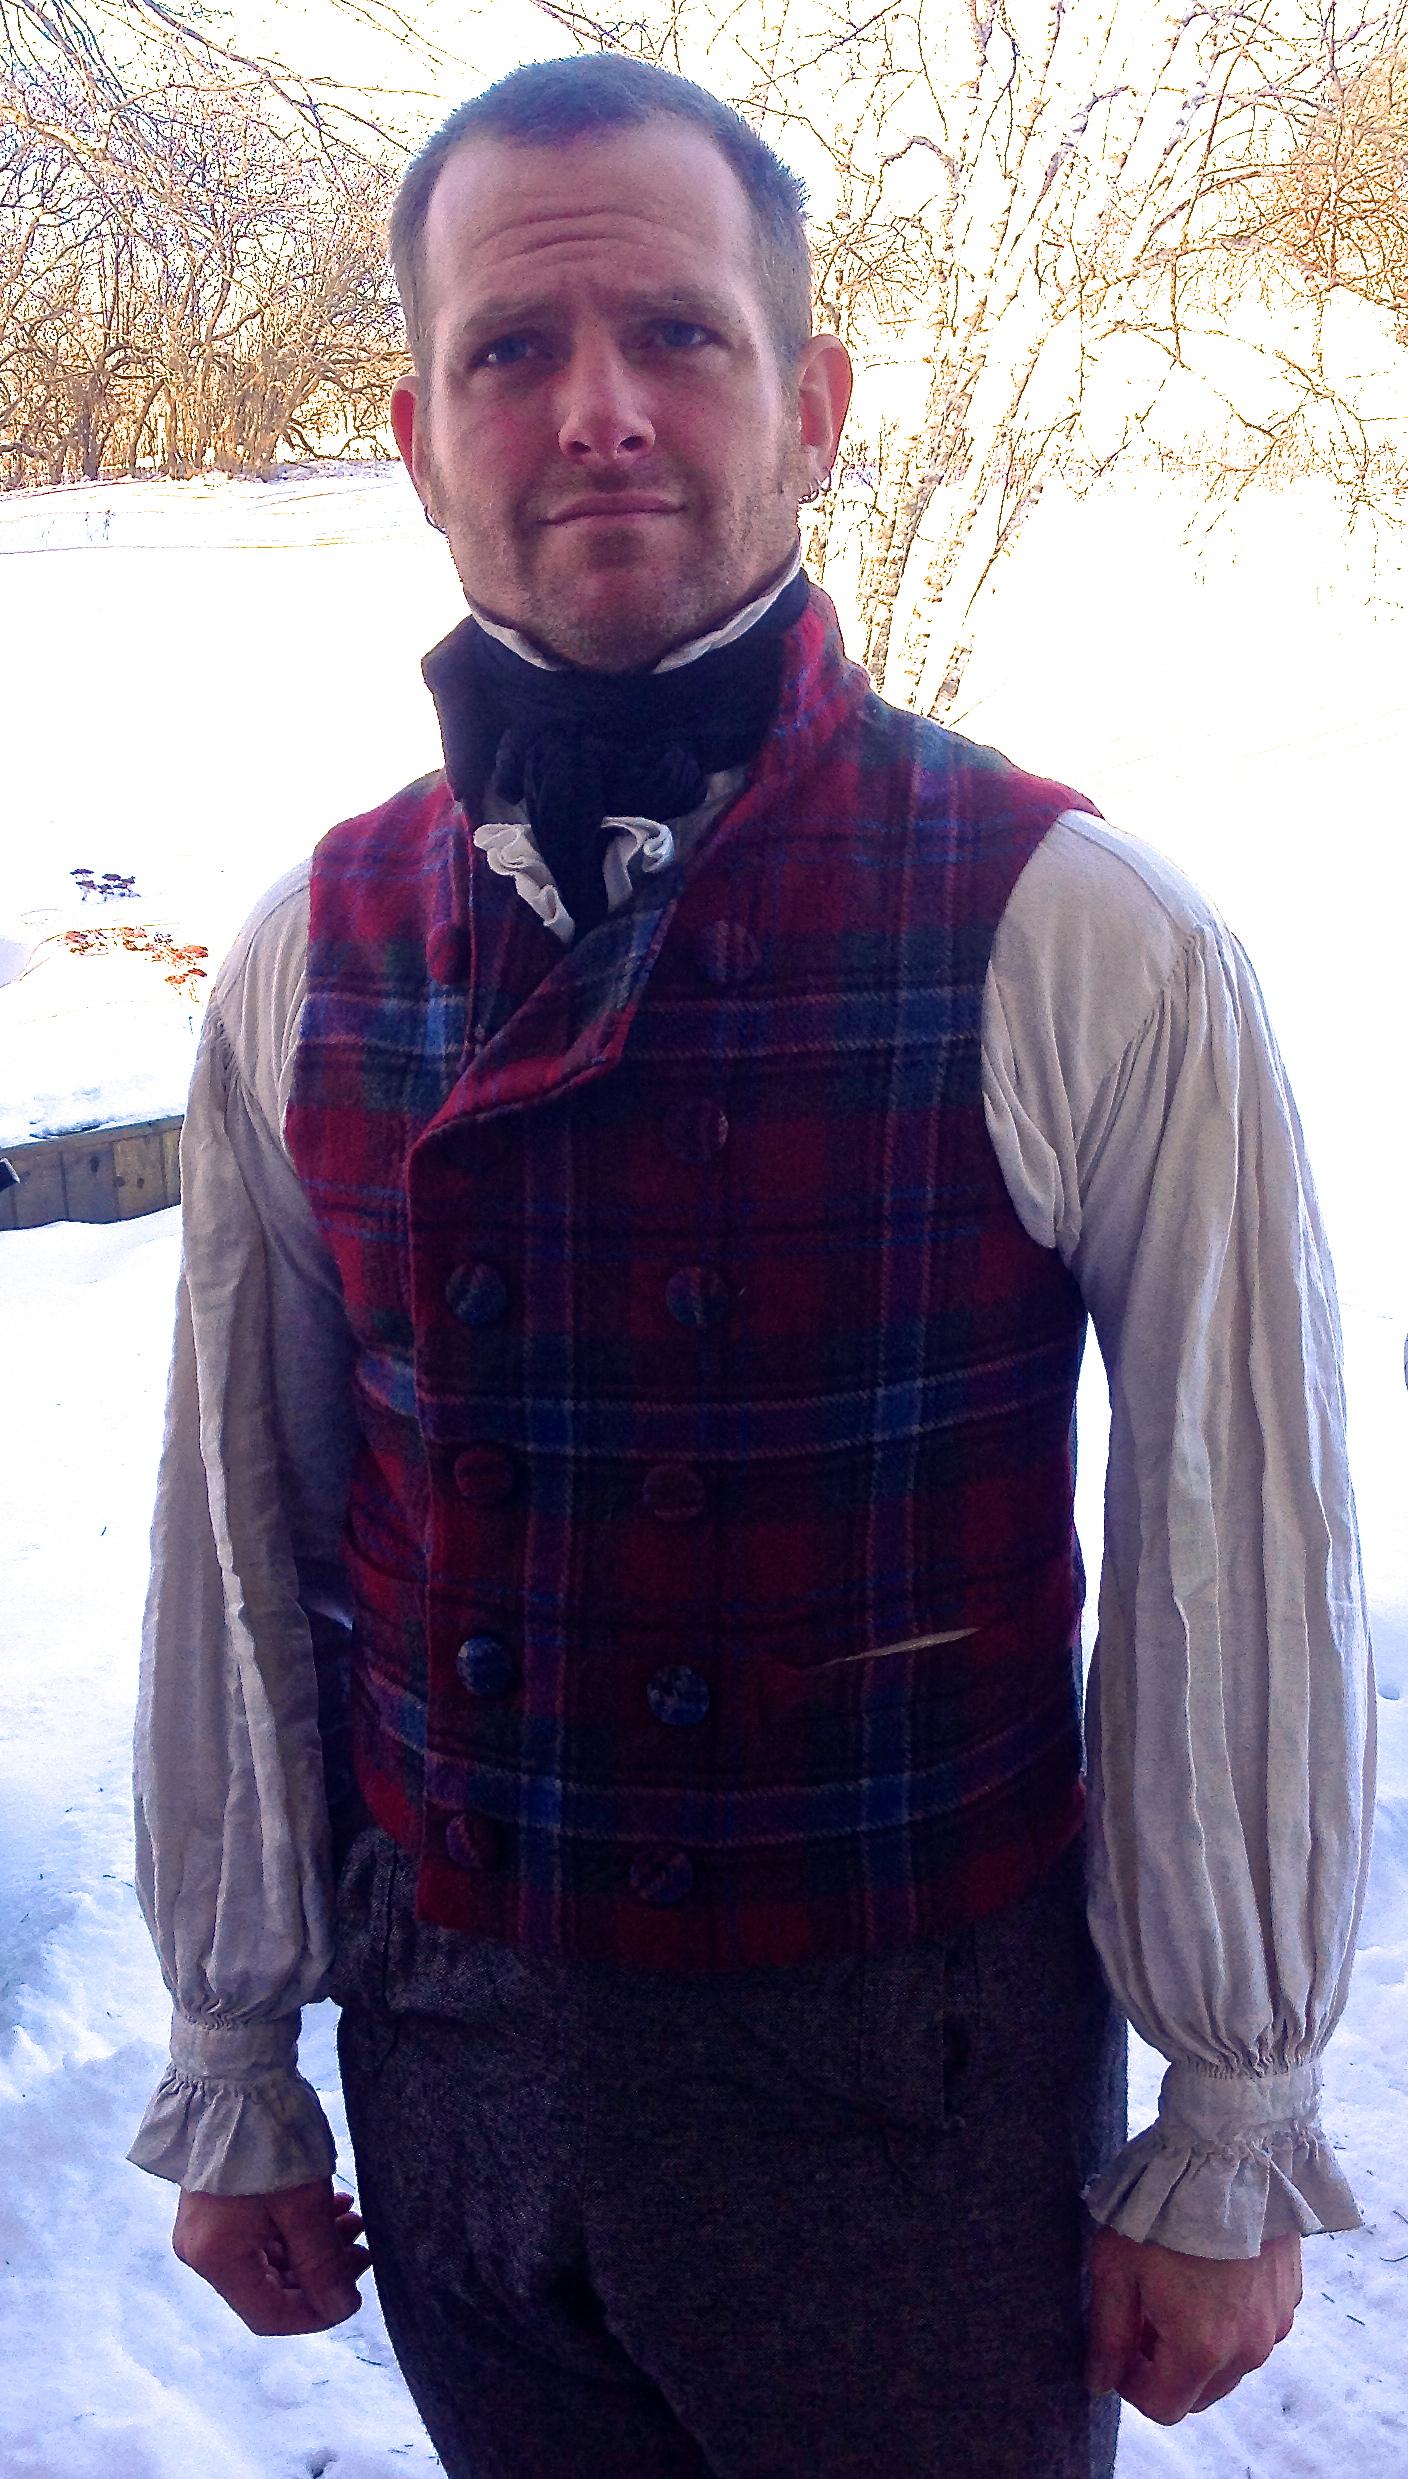 Polar Vortex means warmer clothes